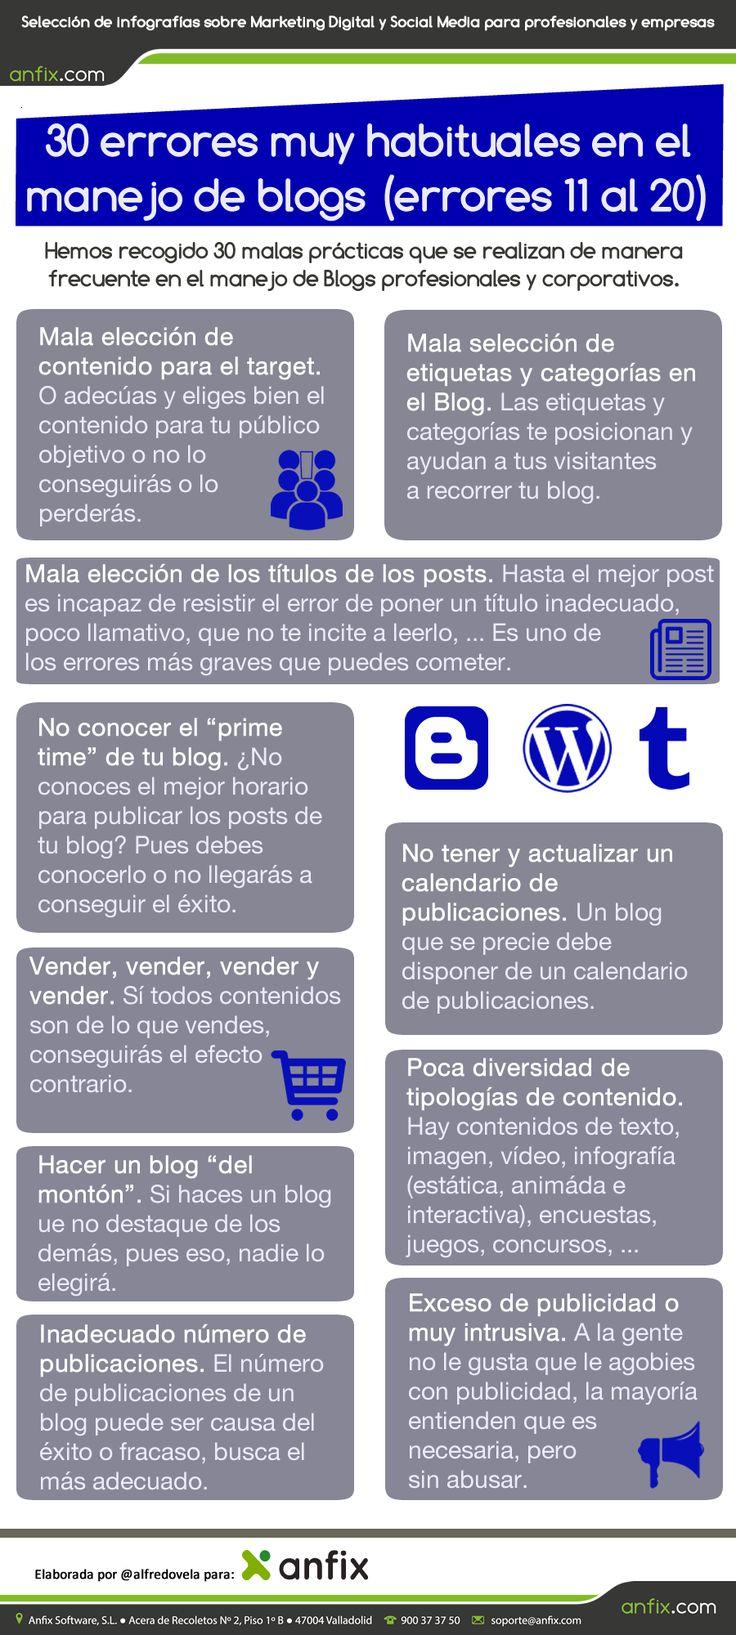 #Infografia #CommunityManager 30 errores en el manejo de blogs (errores 11 al 20) #TAVnews